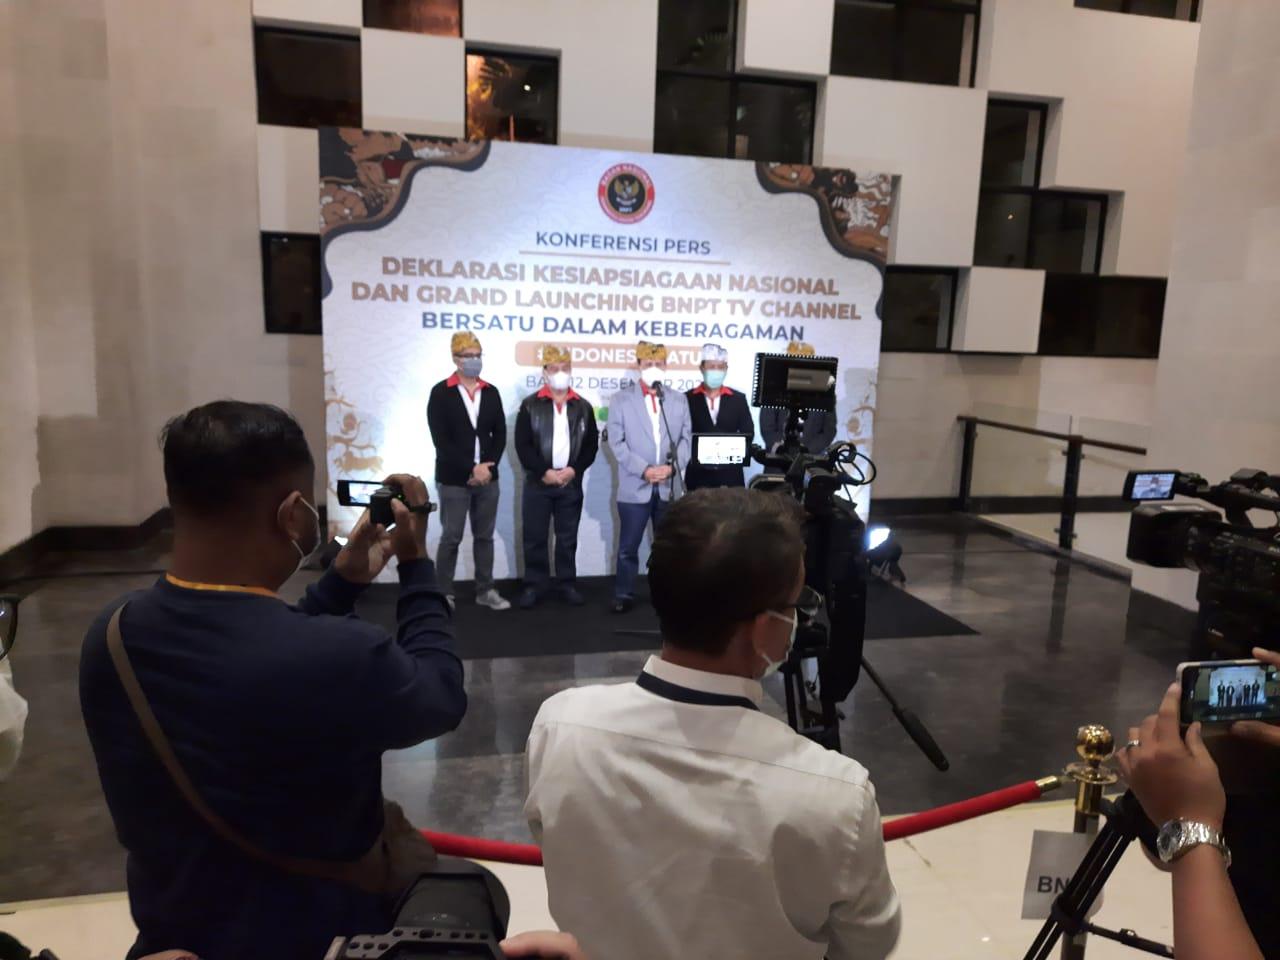 Deklarasi Kesiapsiagaan Nasional Dan Grand Launching BNPT TV Channel. (Foto: Dokumen)